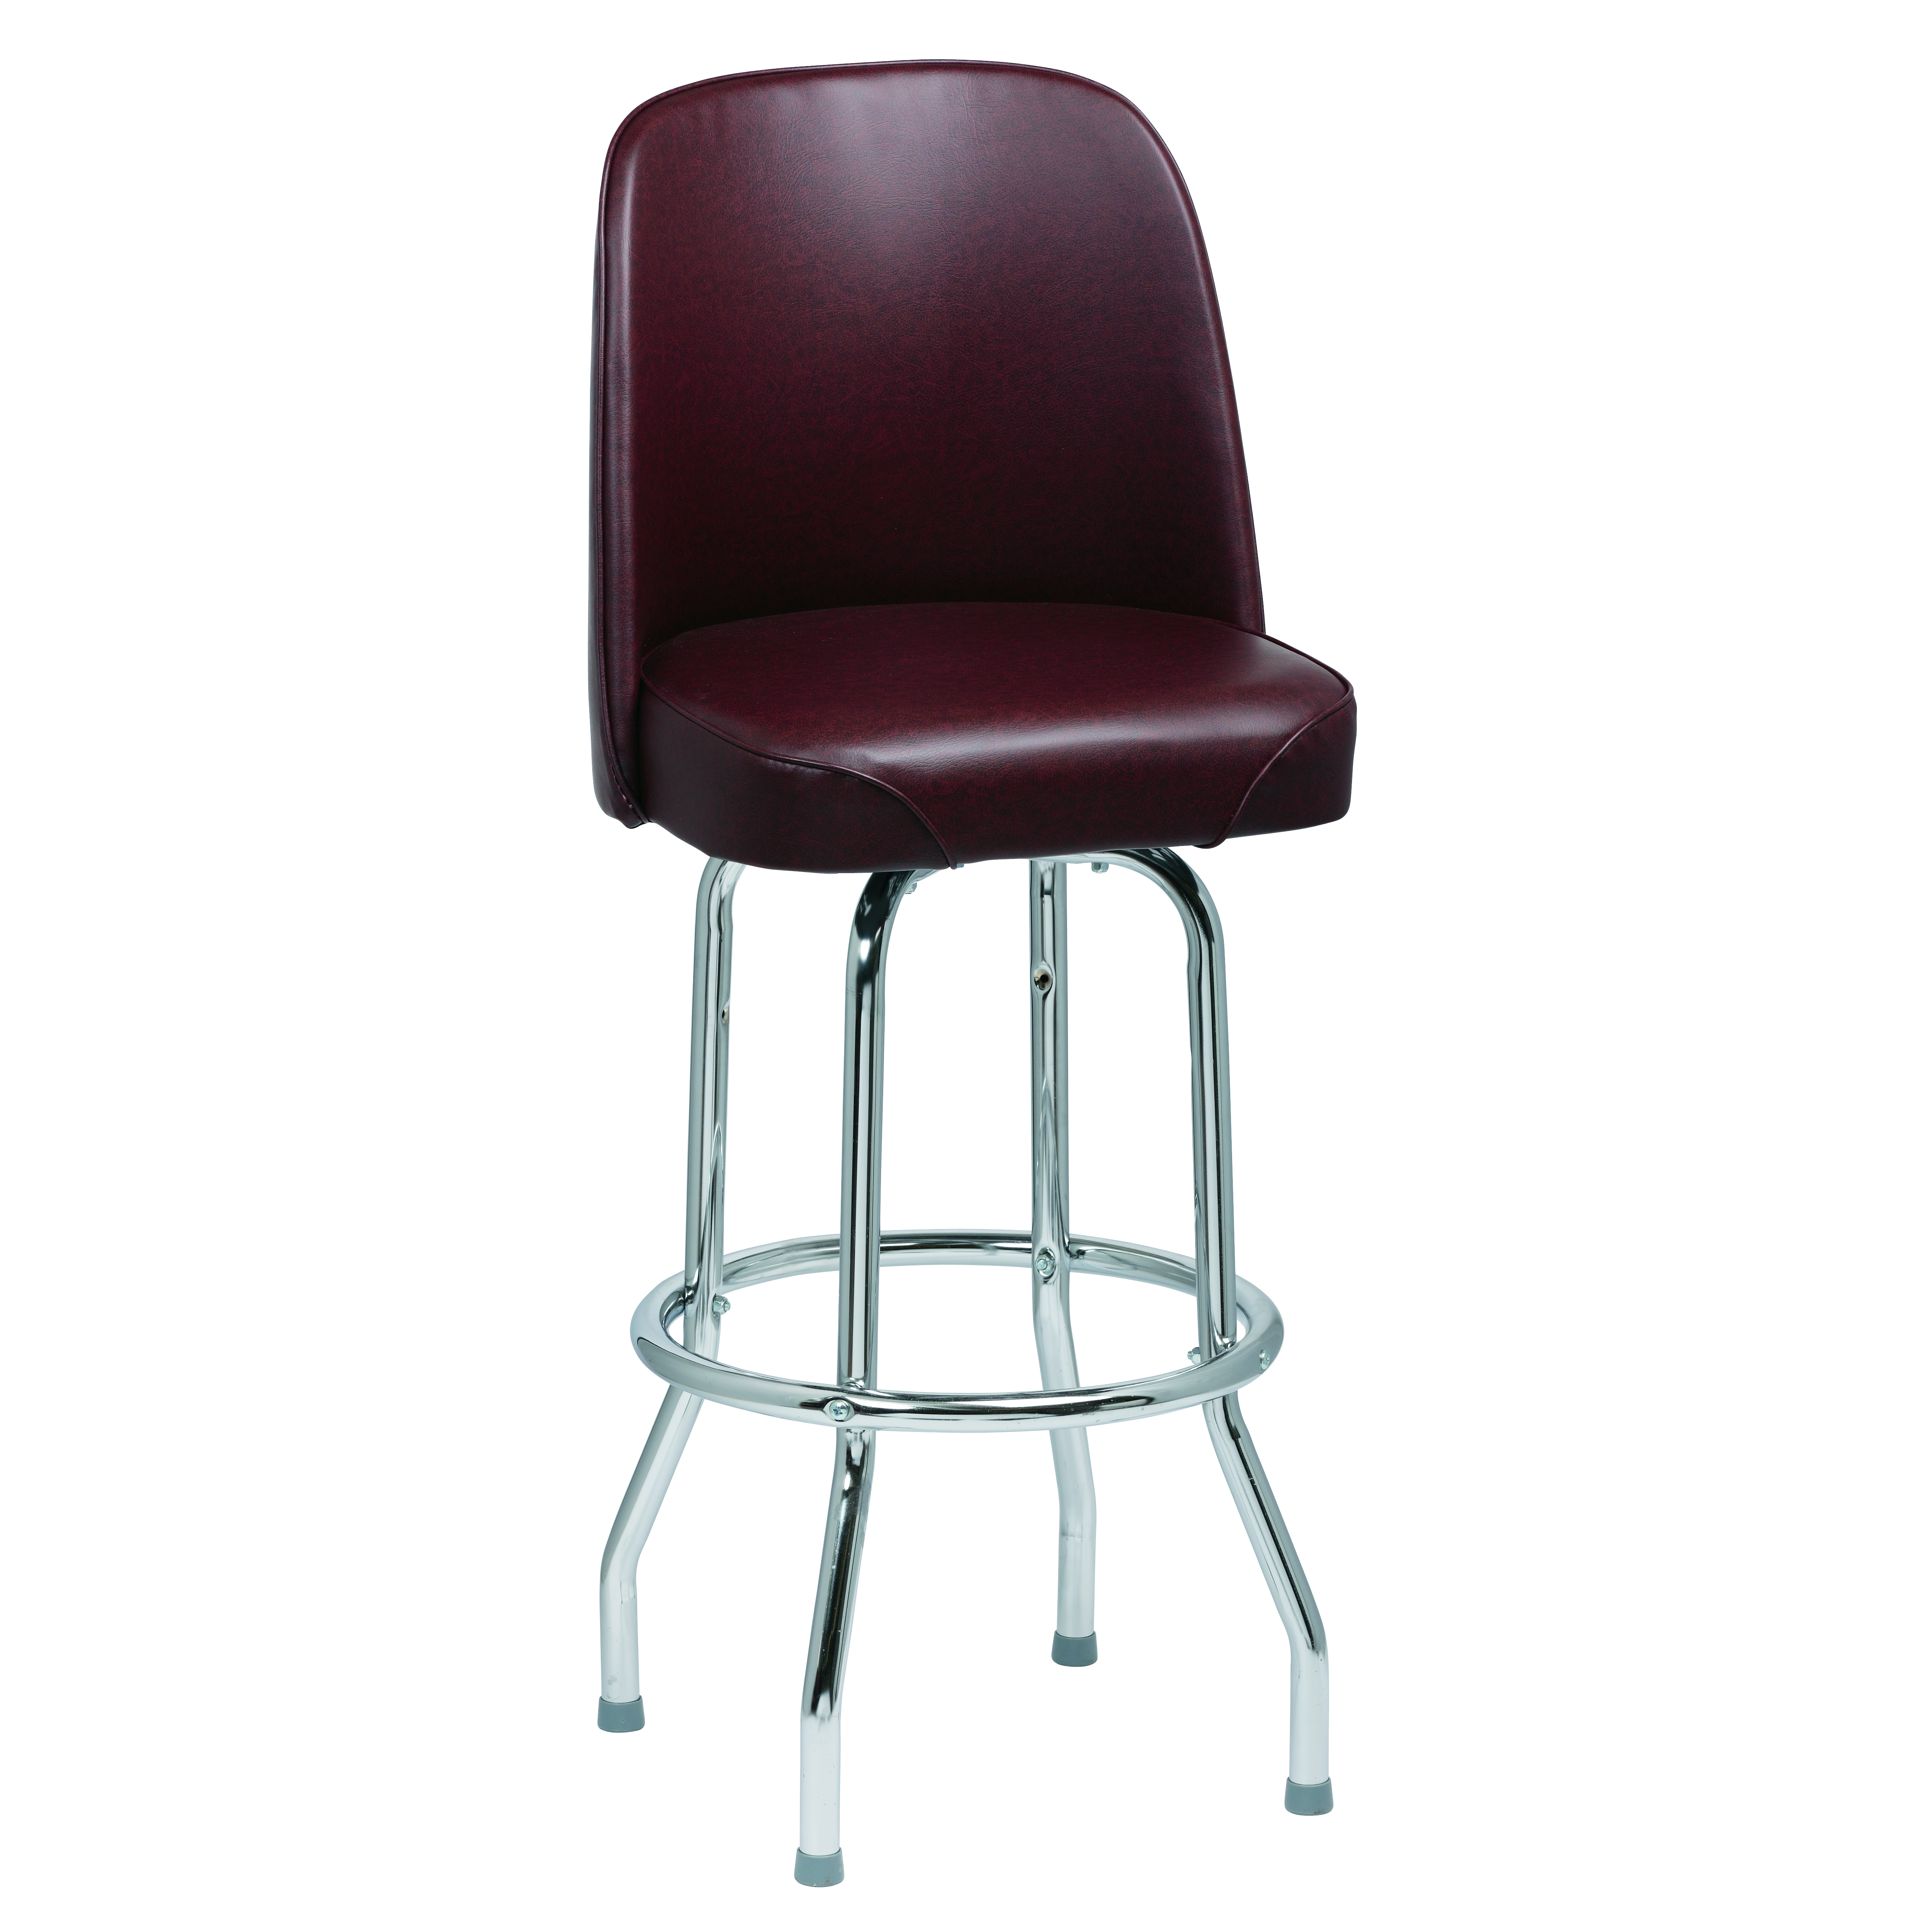 Royal Industries ROY 7721 BRN bar stool, swivel, indoor